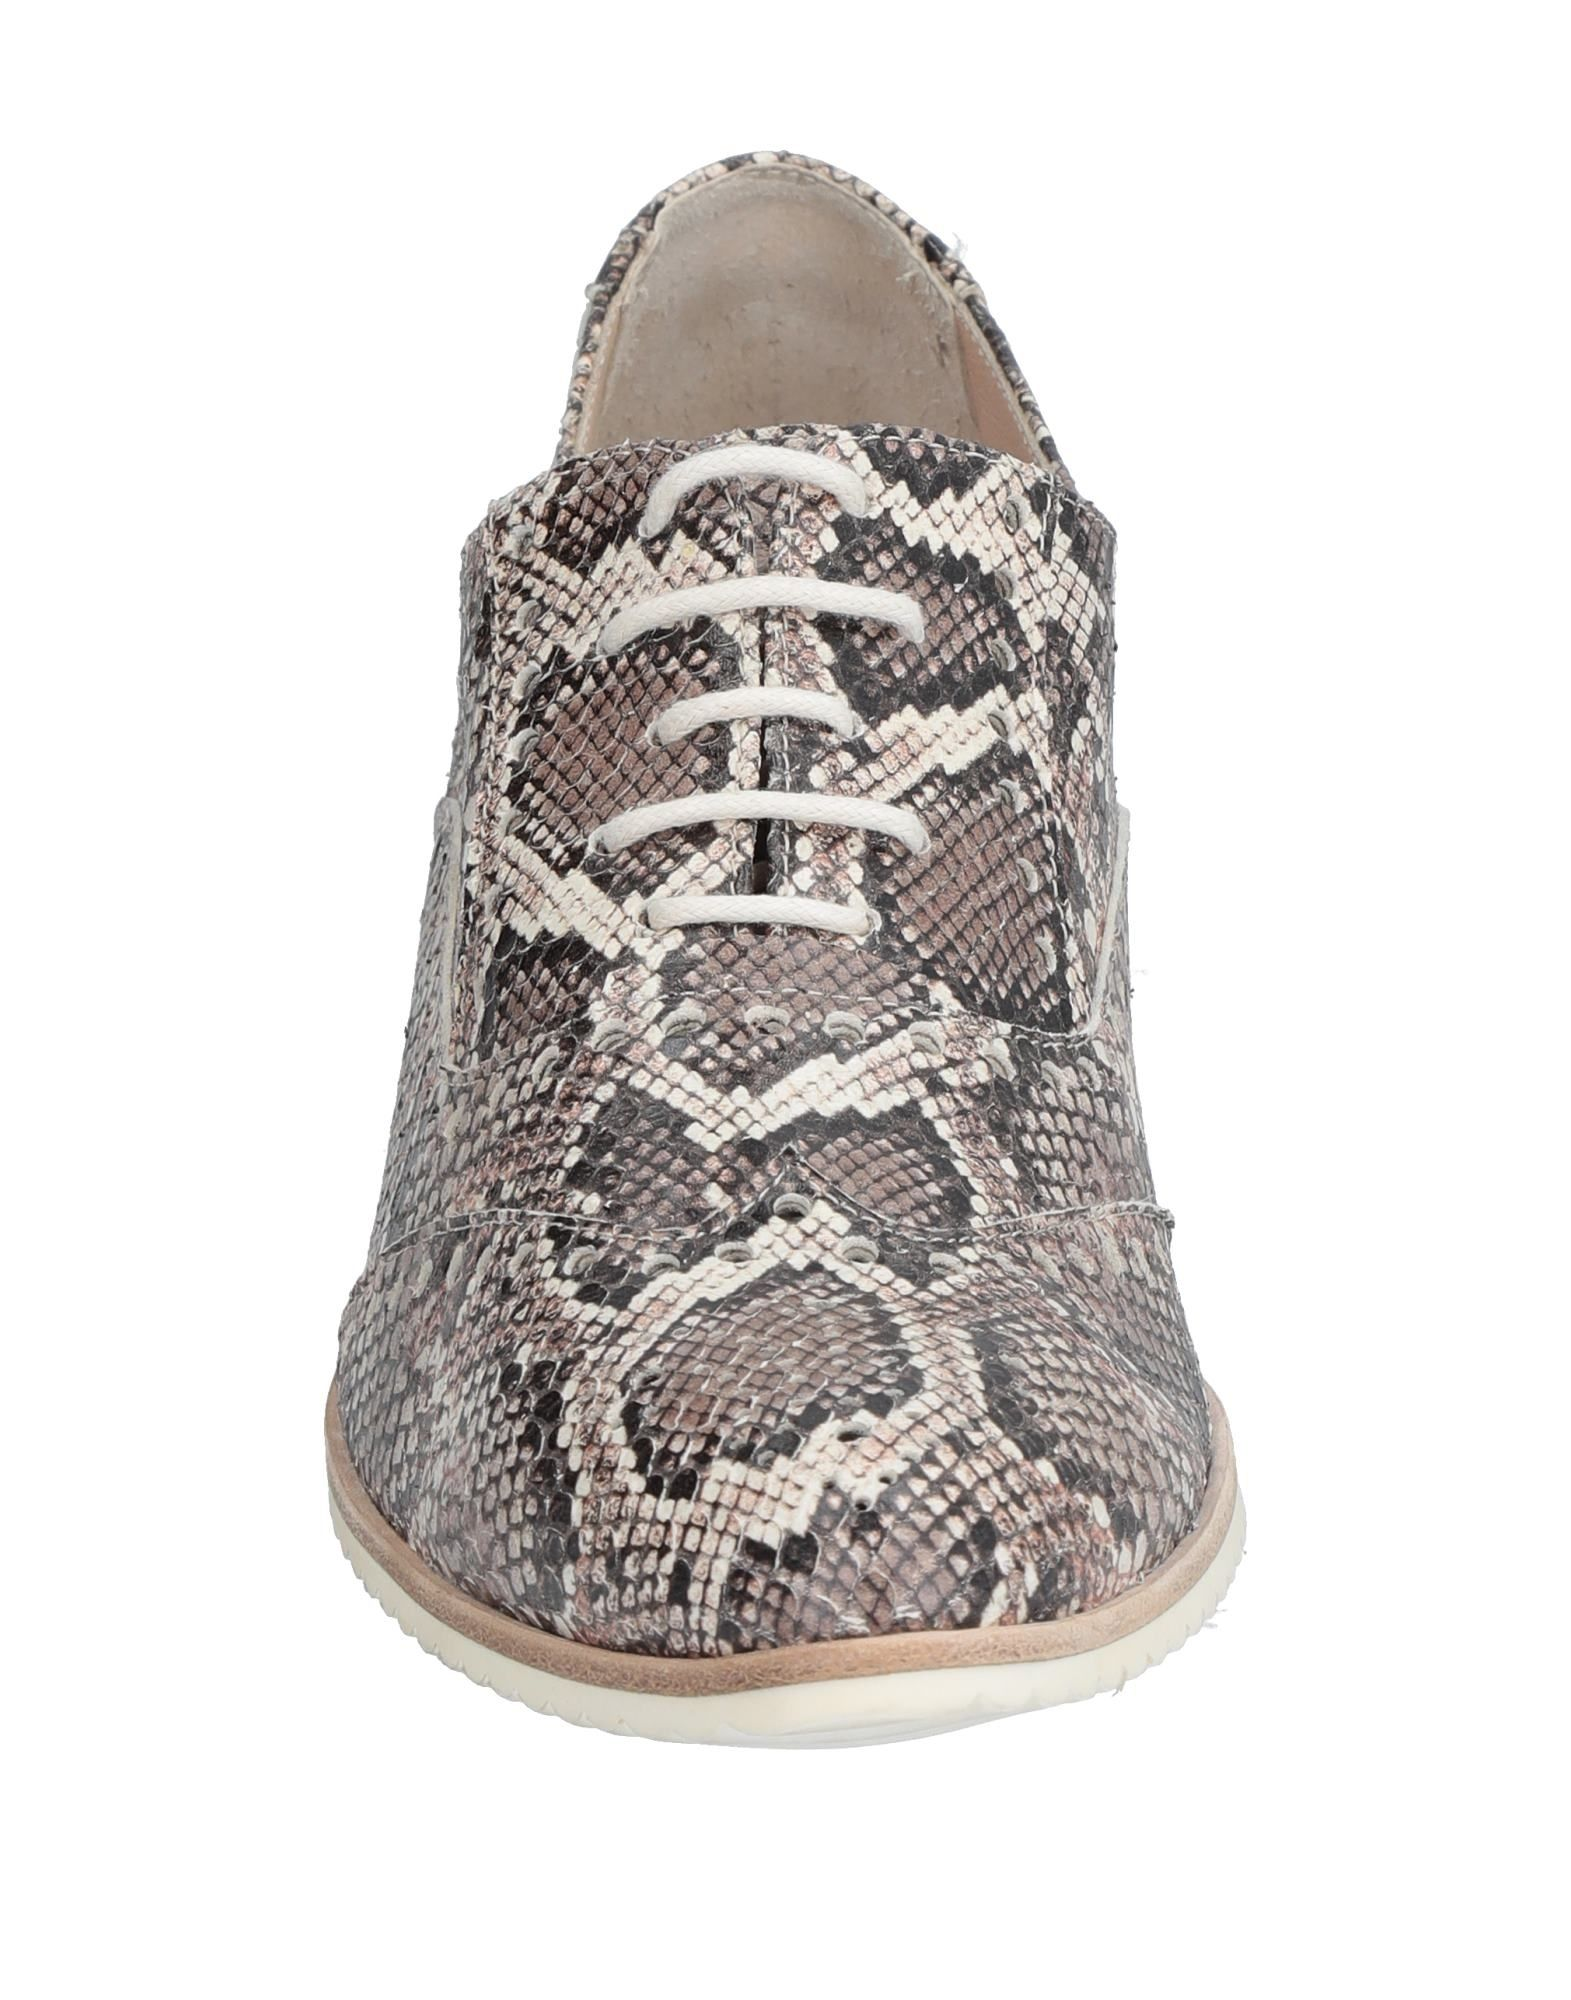 Stilvolle billige Schuhe F.Lli F.Lli F.Lli Bruglia Schnürschuhe Damen  11537453CF a22f09